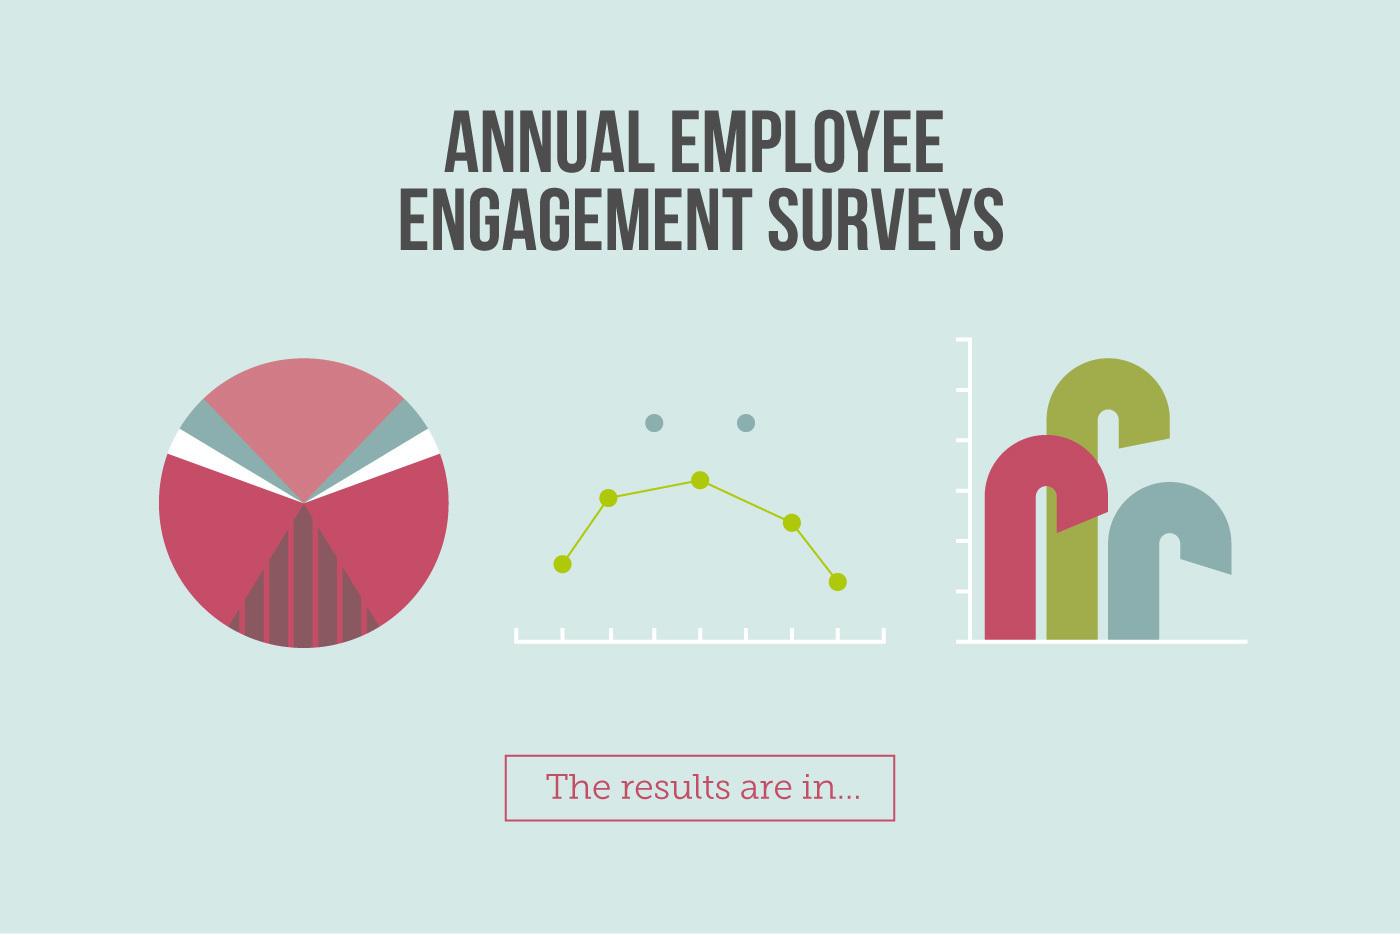 Death of annual engagement surveys header image